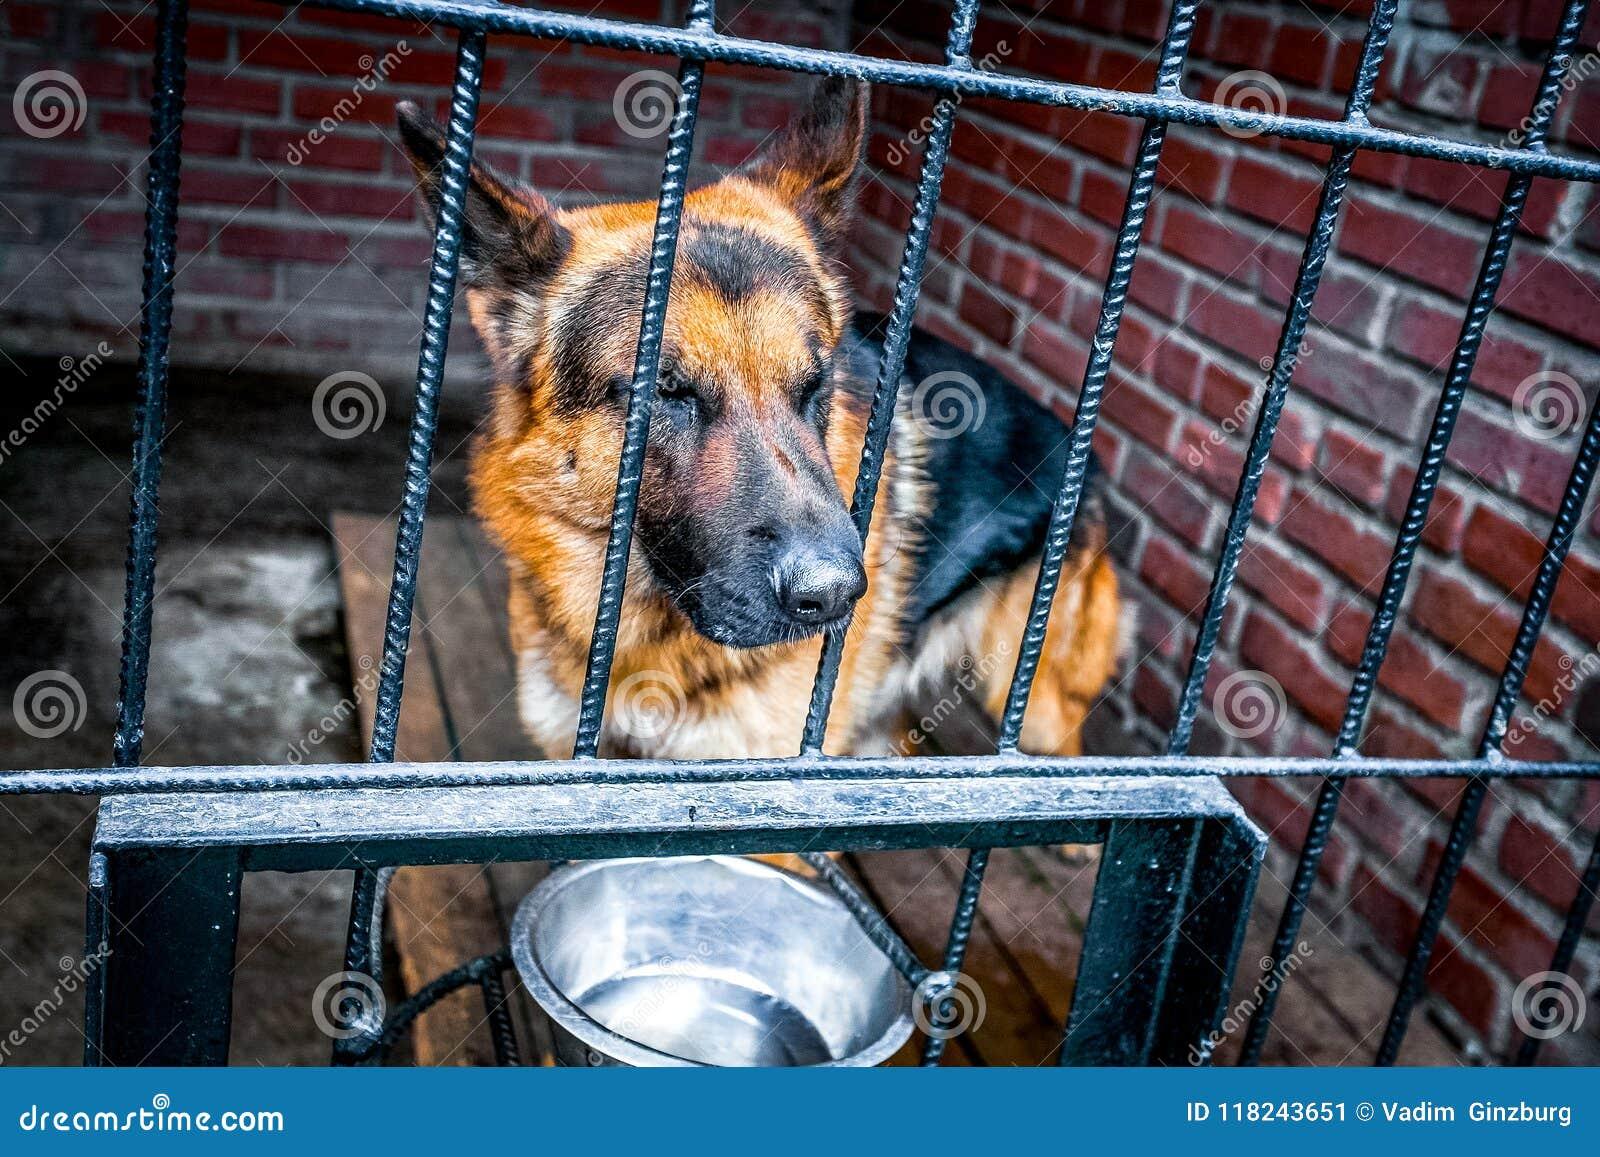 Sad dog german shepherd in a cage